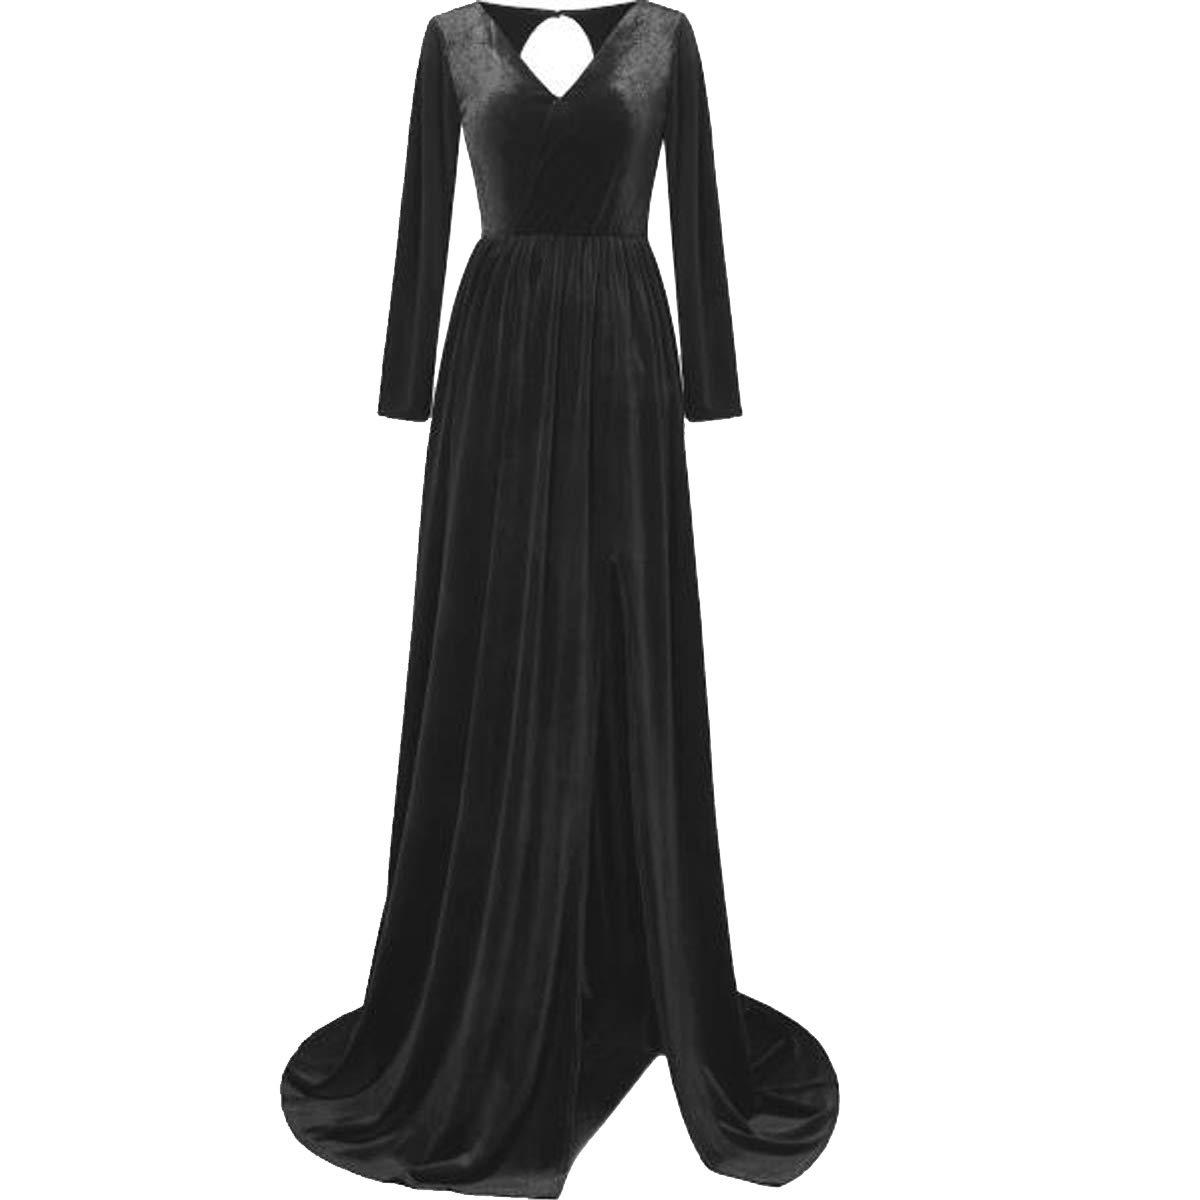 Black TTYbridal VNeck Court Train Velvet Evening Dresses Backless Long Prom Cocktail Gown with Split Side V16